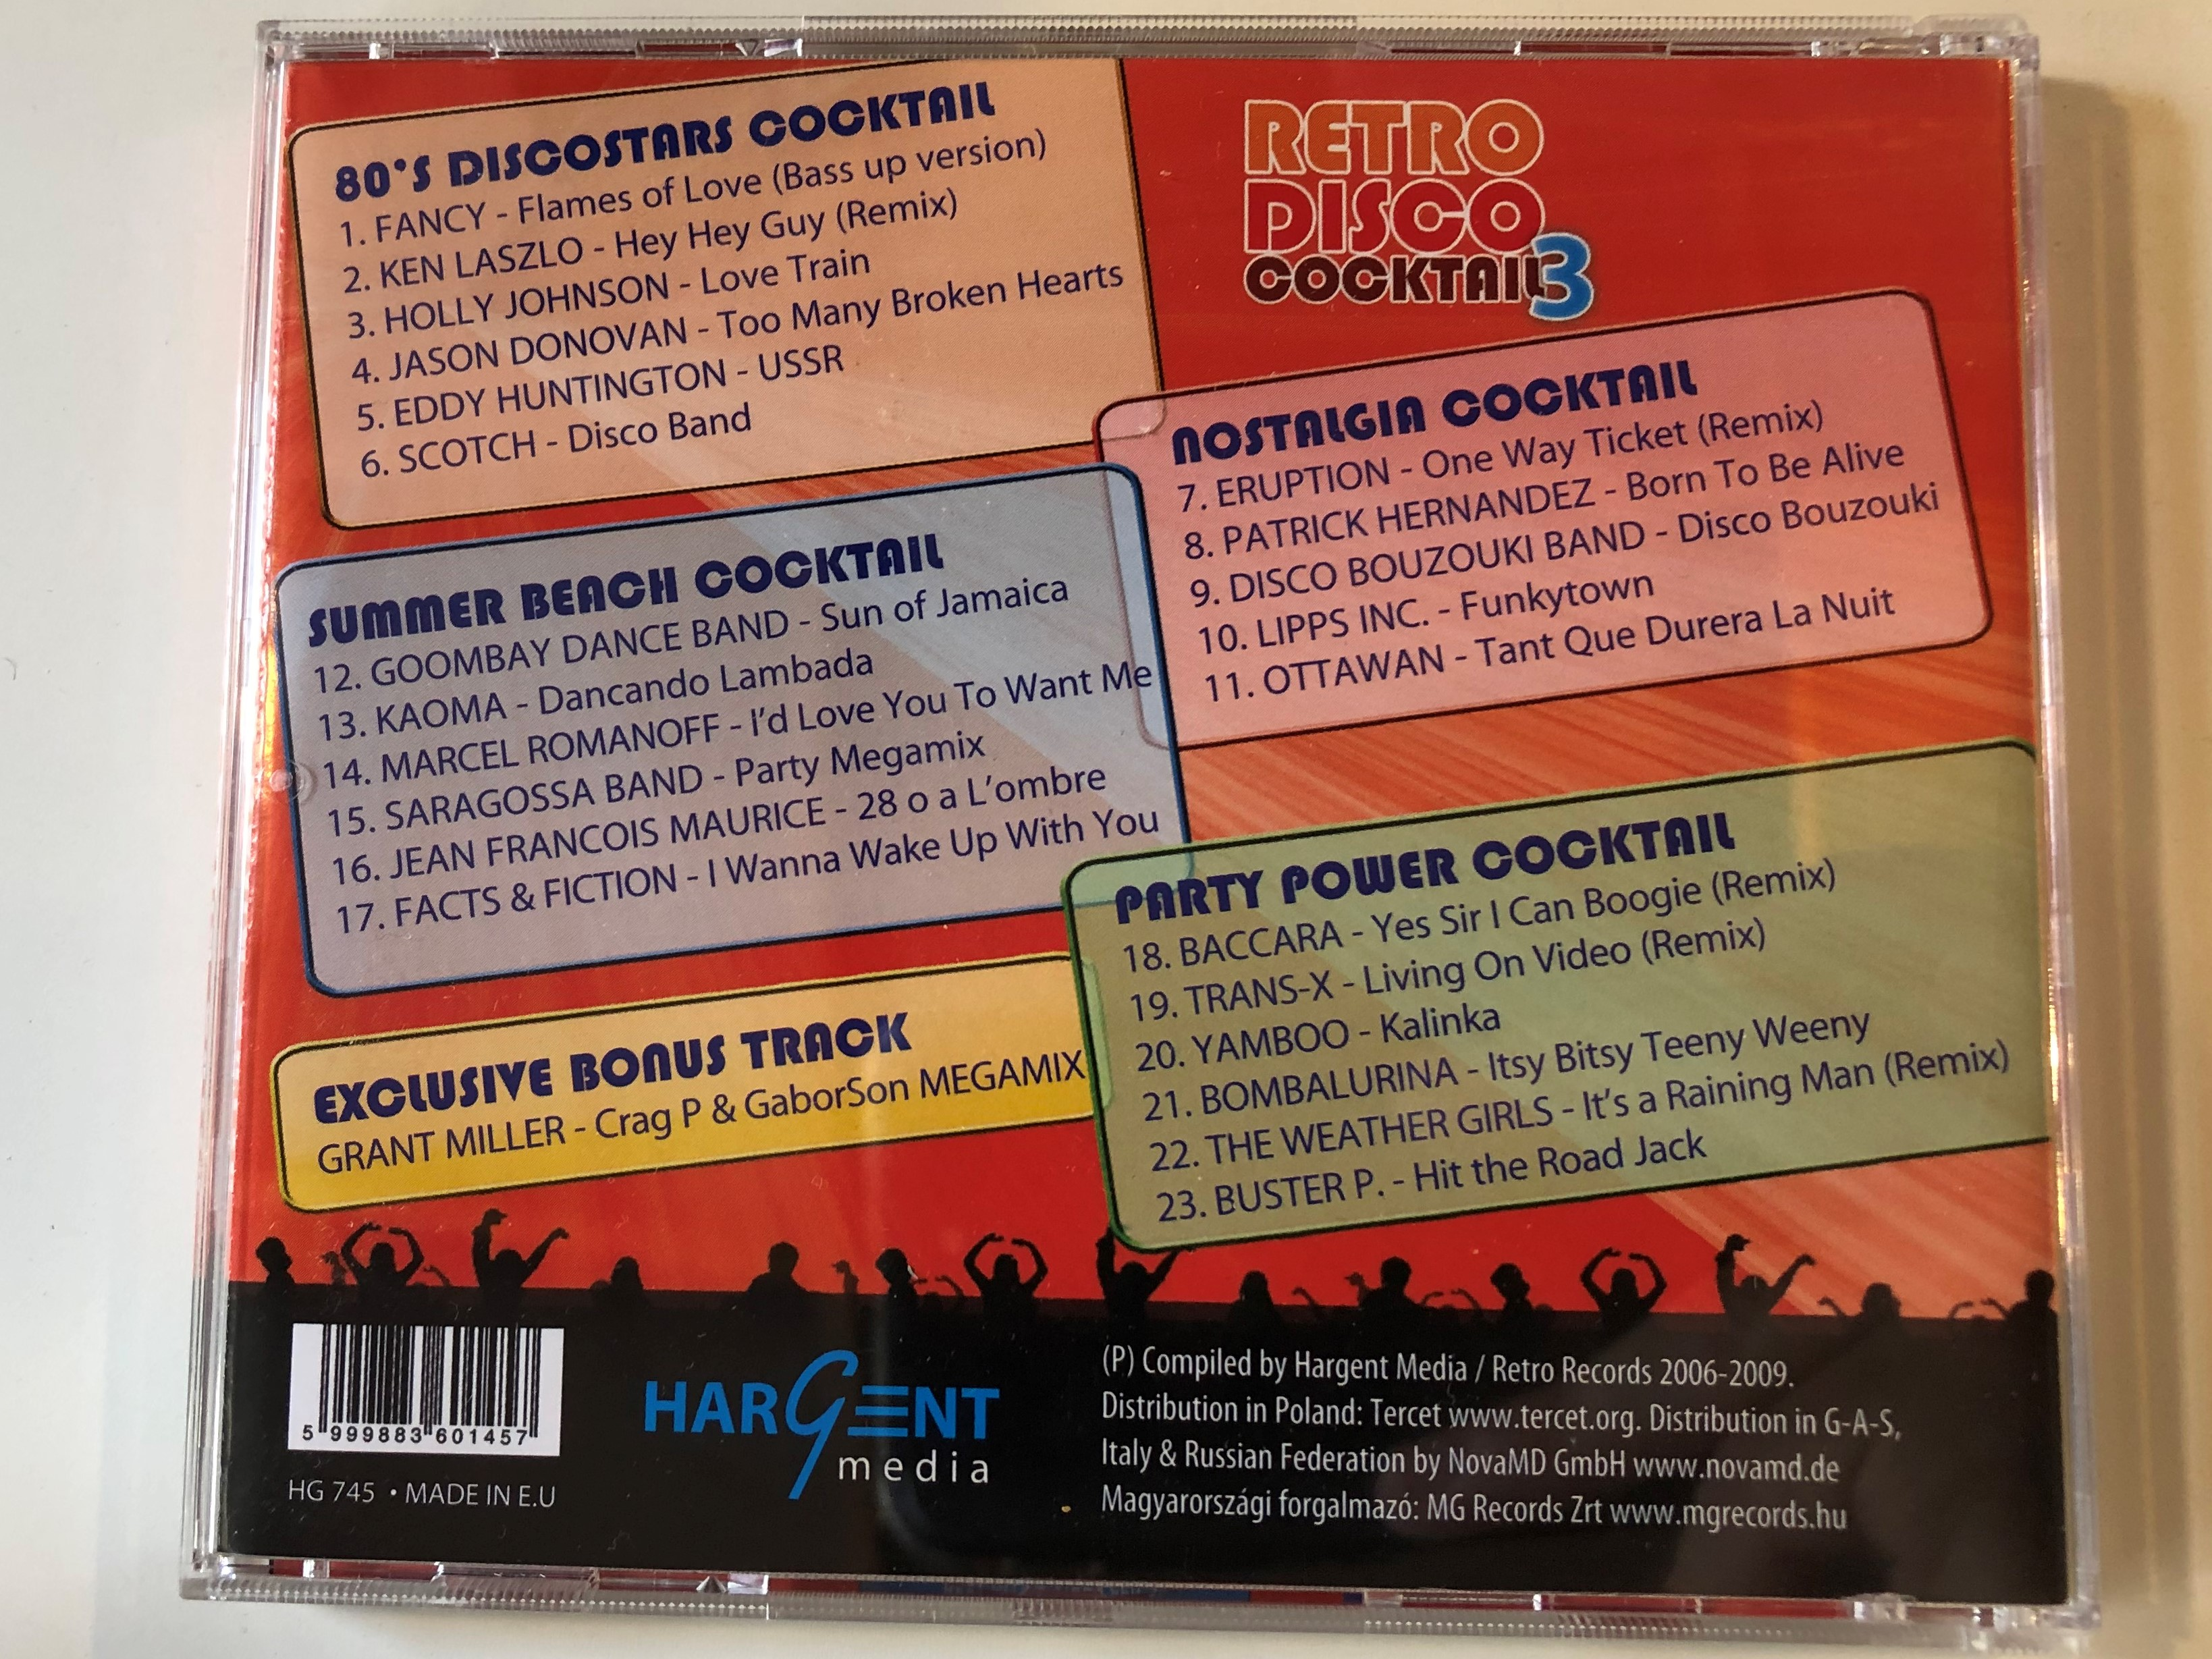 retro-disco-cocktail-3-saragossa-band-patrick-hernandez-kaoma-baccara-jason-donovan-holly-johnson-ken-laszlo-fancy-scotch-eruption-eddy-huntington-incl.-exclusive-bonus-grant-miller.jpg